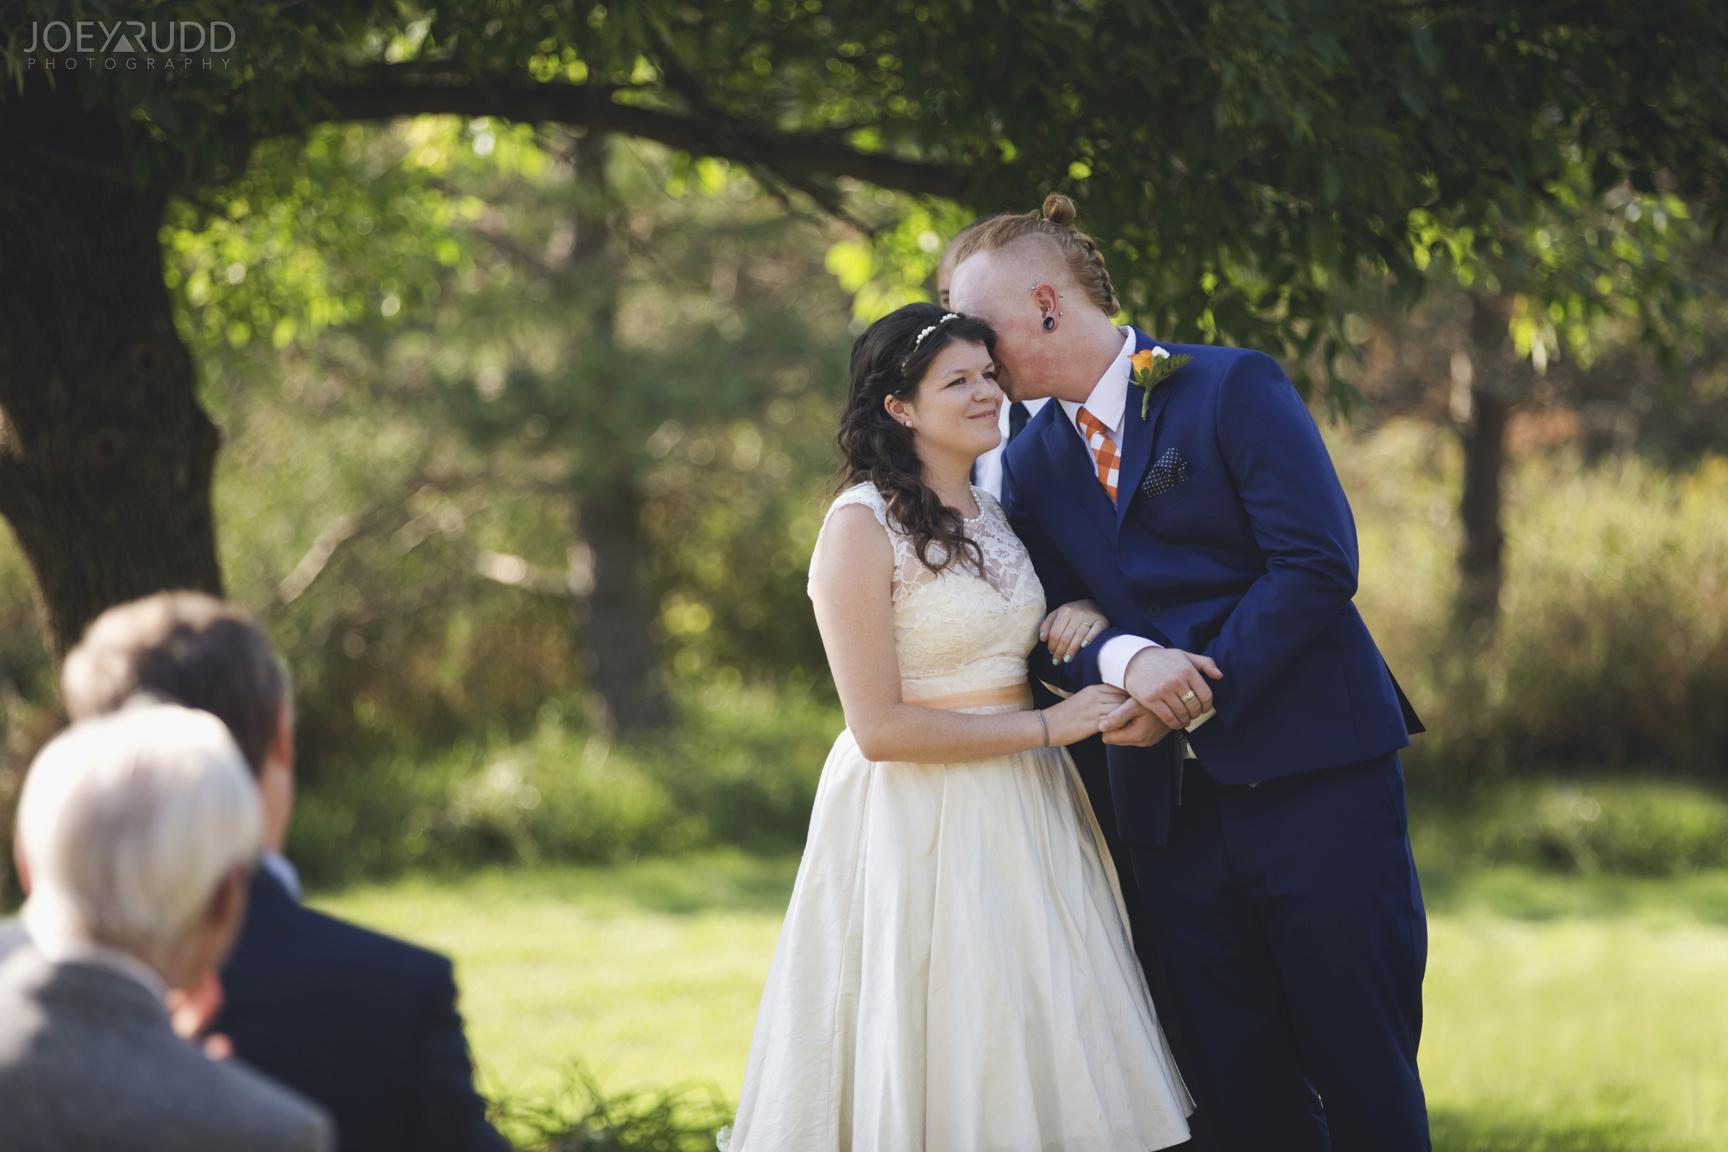 Backyard Kingston Wedding by Ottawa Wedding Photographer Joey Rudd Photography Love